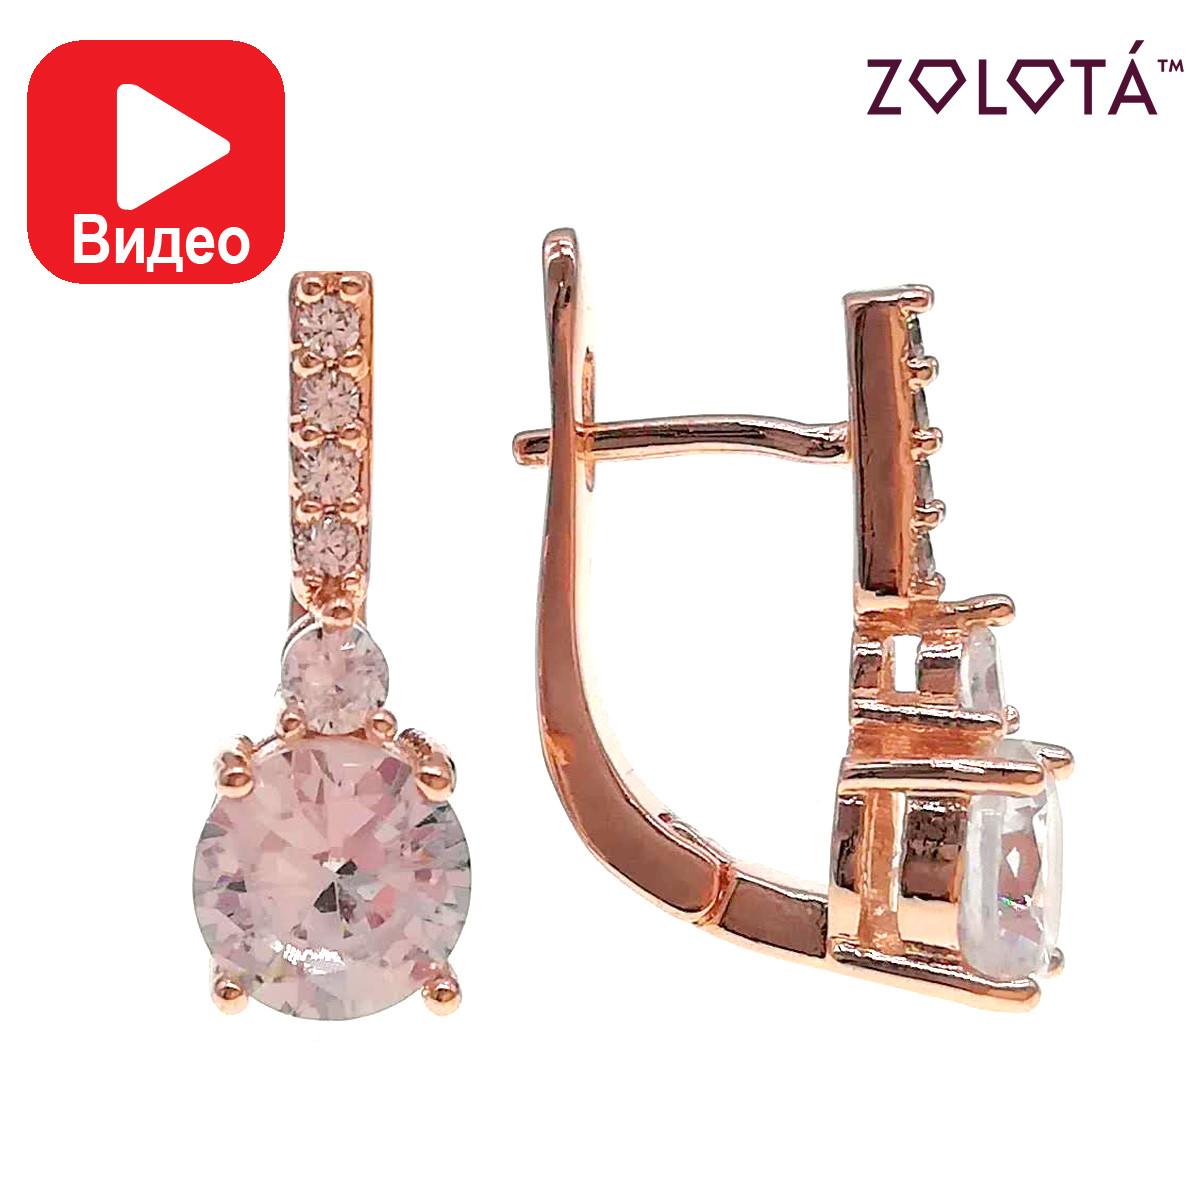 Серьги Zolota, размер 19х7 мм, белые фианиты (куб. цирконий), вес 4 г, позолота PO, ЗЛ00928 (1)